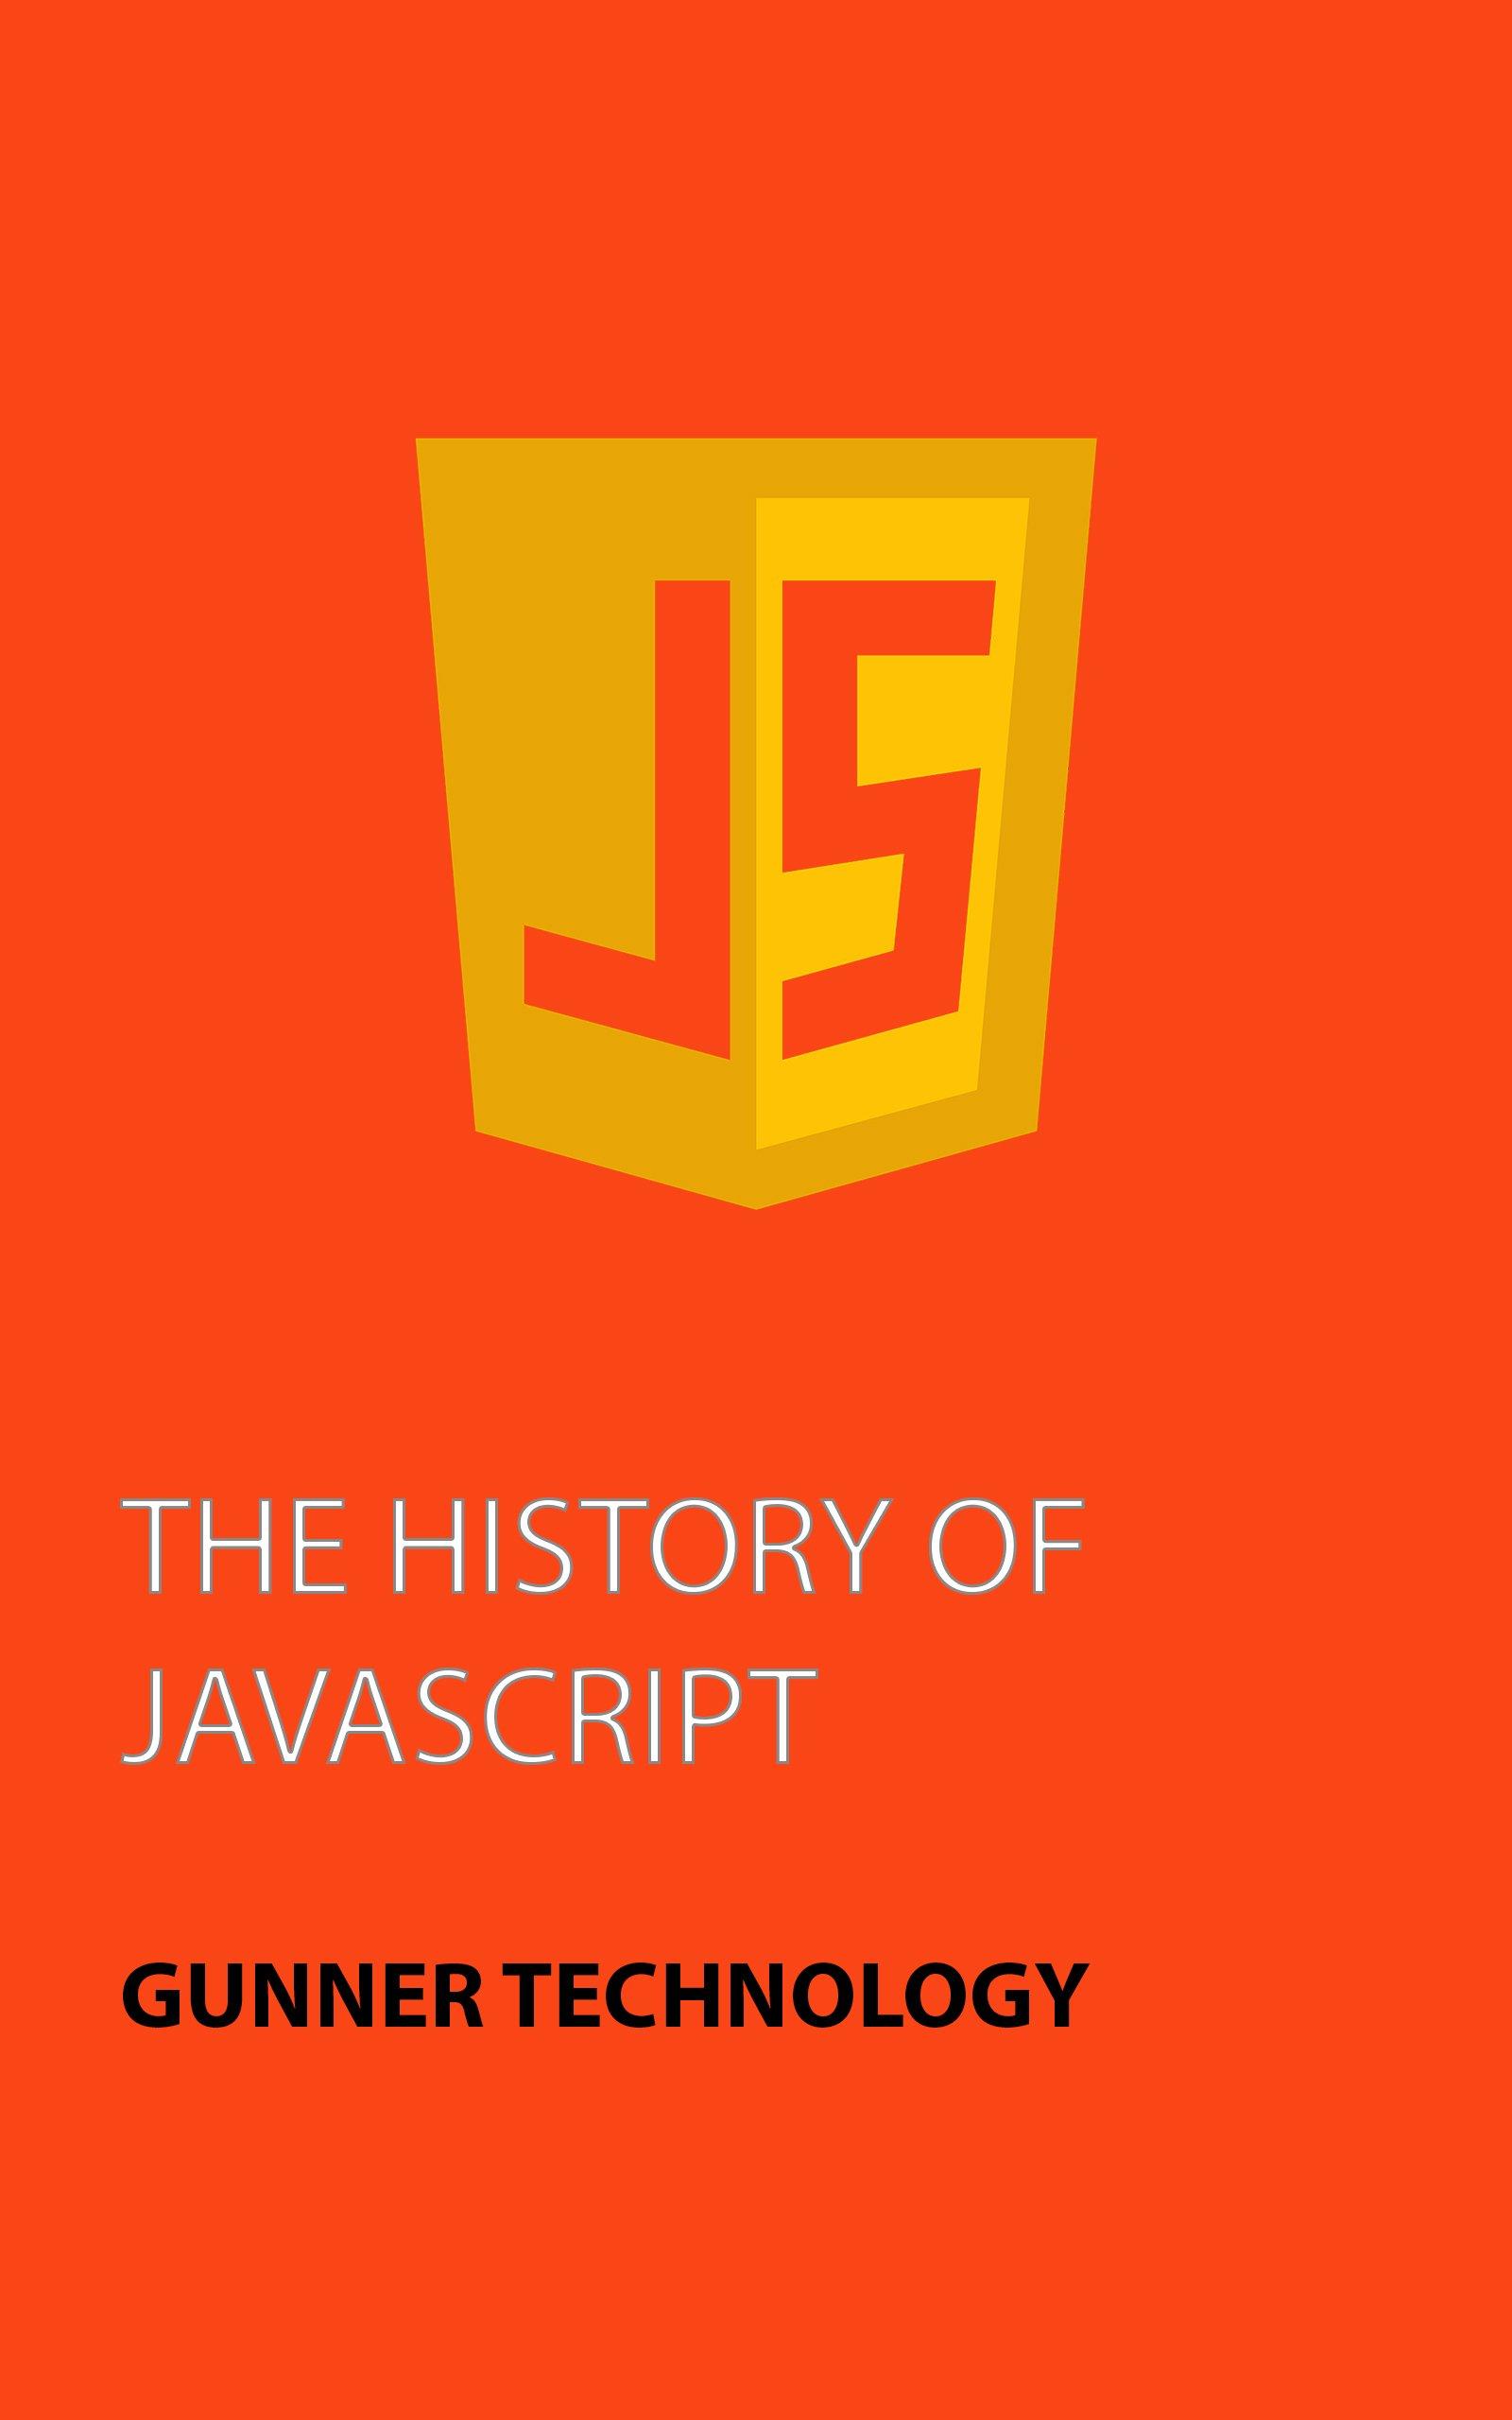 The History of JavaScript